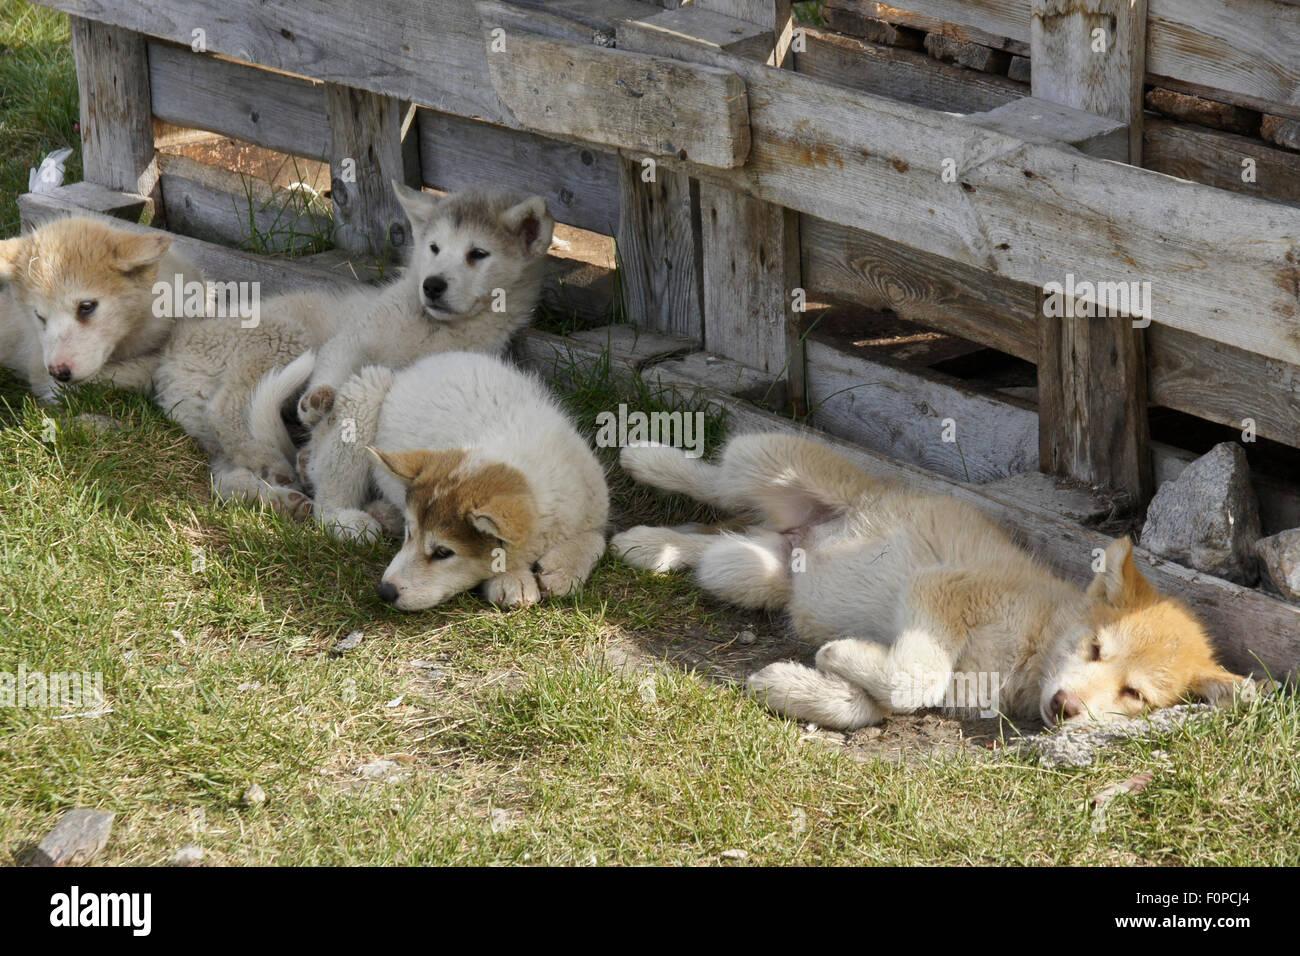 Greenlandic sledge dog pups resting, Ilulissat, West Greenland - Stock Image